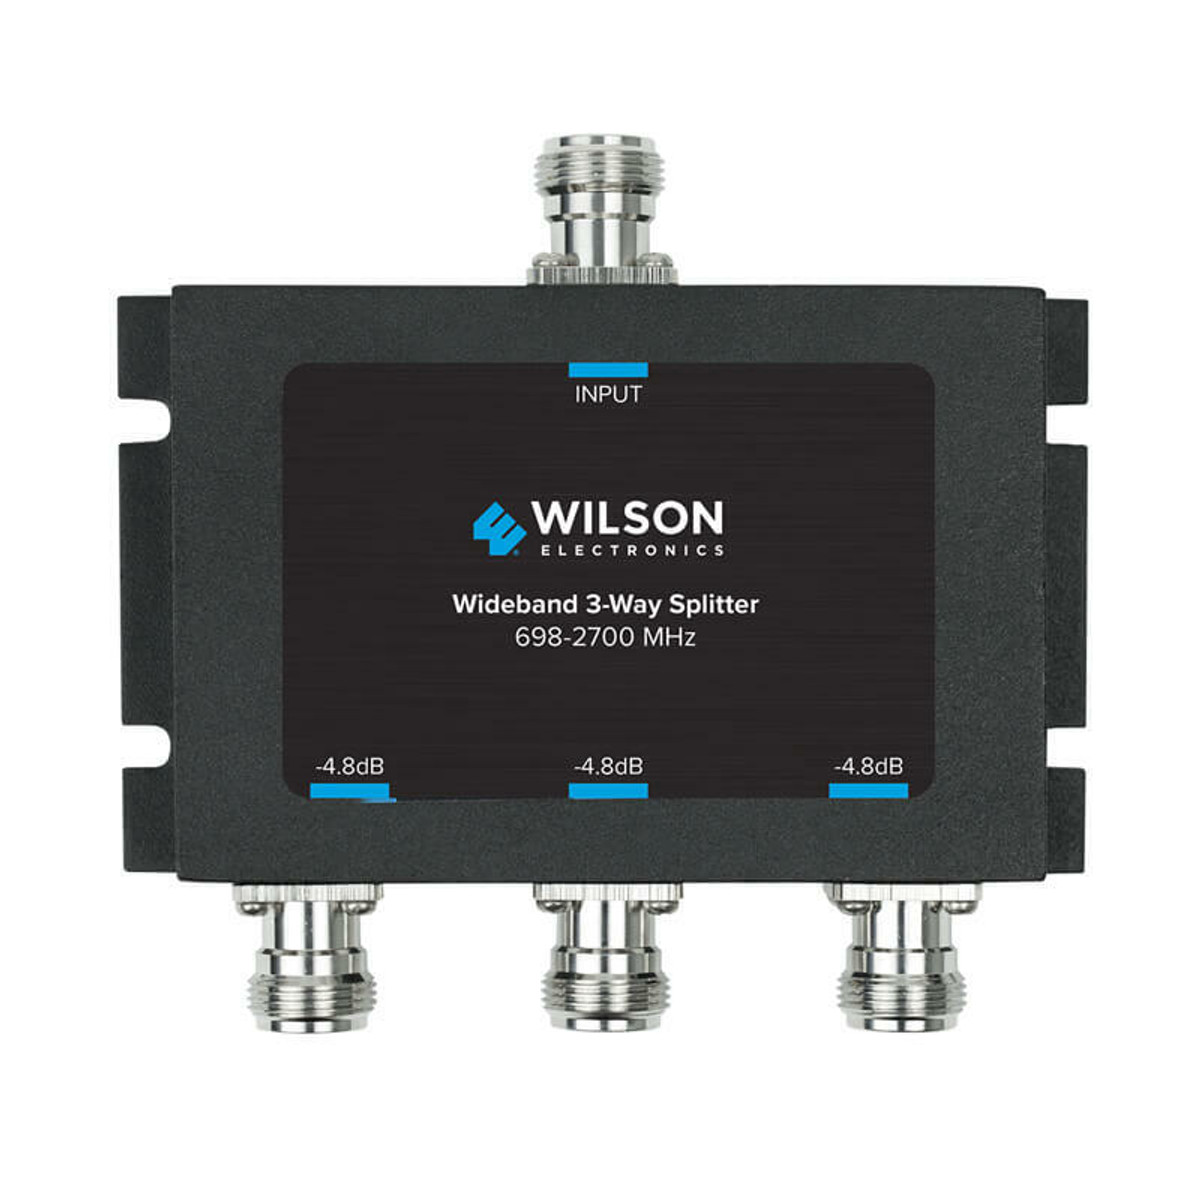 weBoost Wilson -4.8db 3-way Splitter For 700-2700mhz, 50ohm | 859980